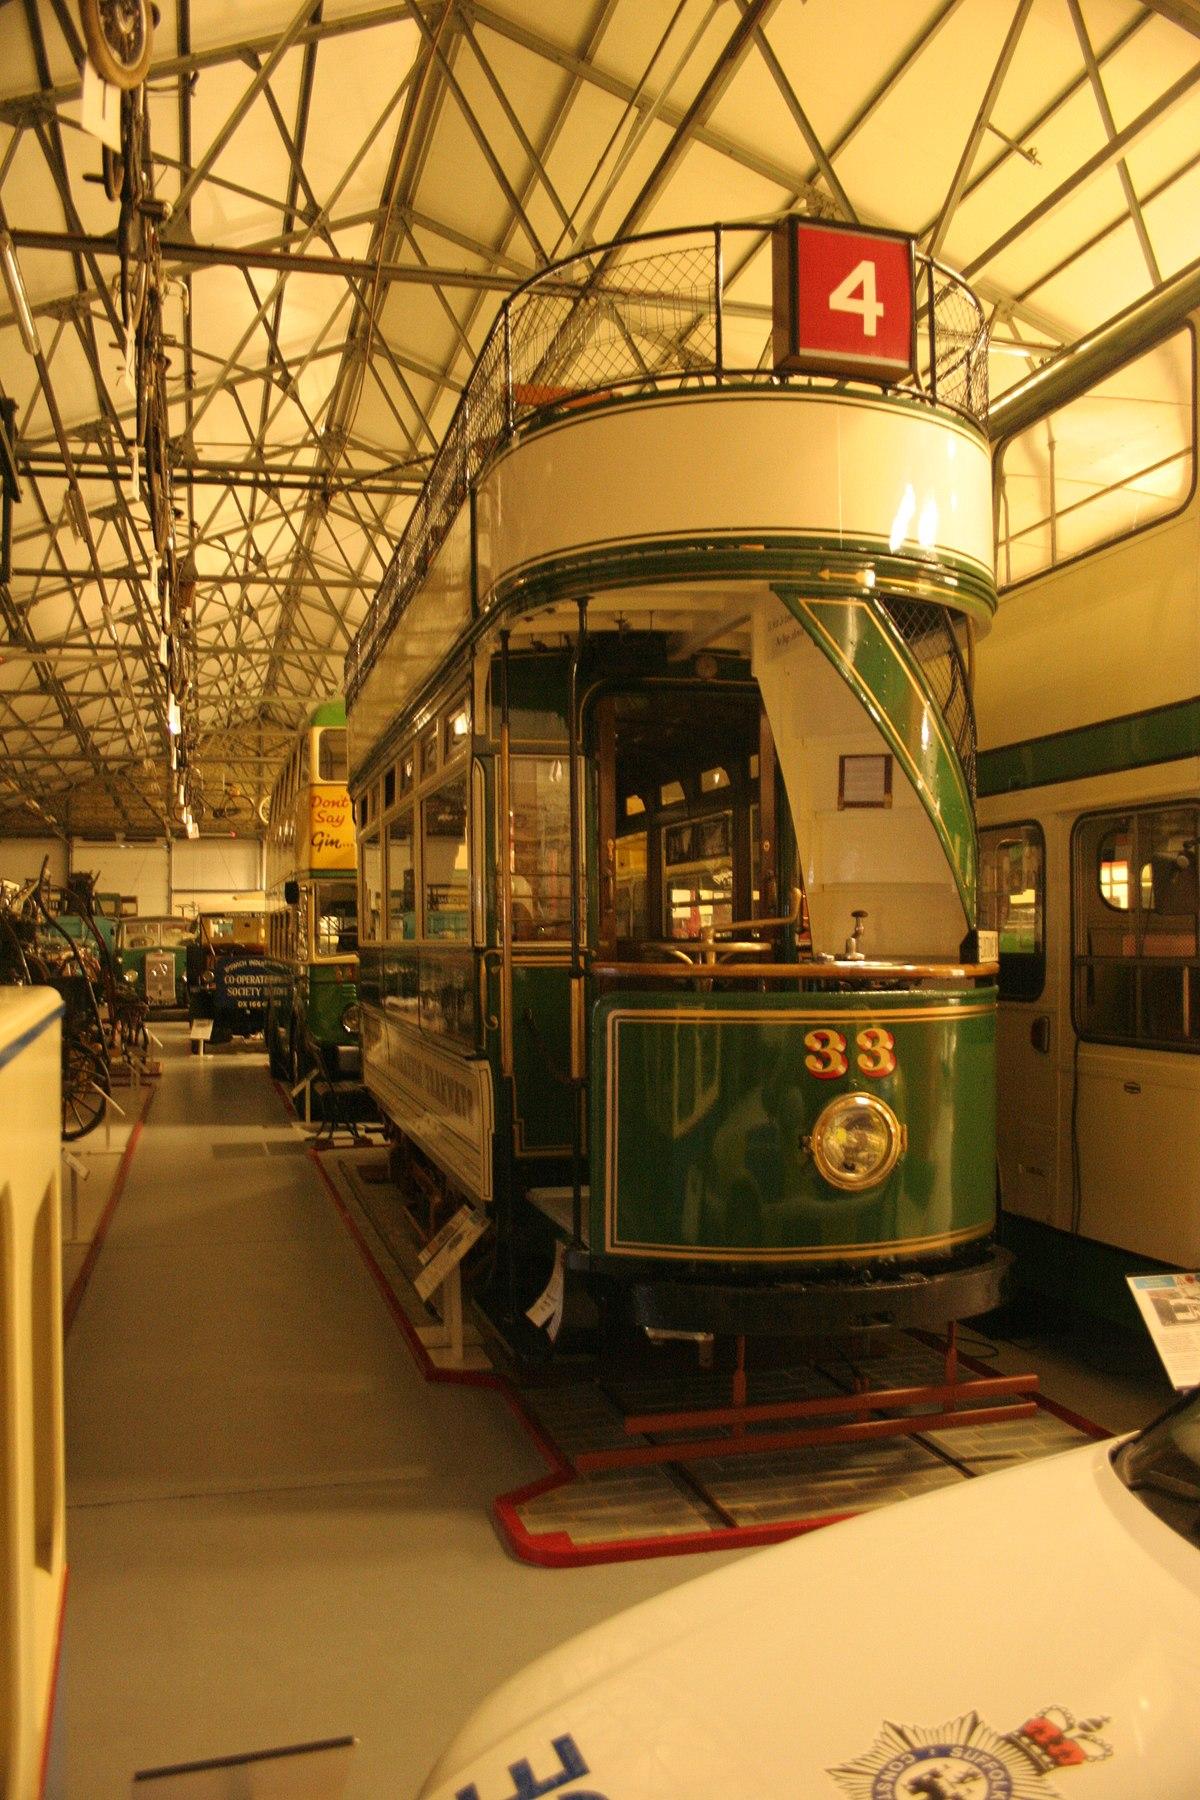 Ipswich Transport Museum - Wikipedia